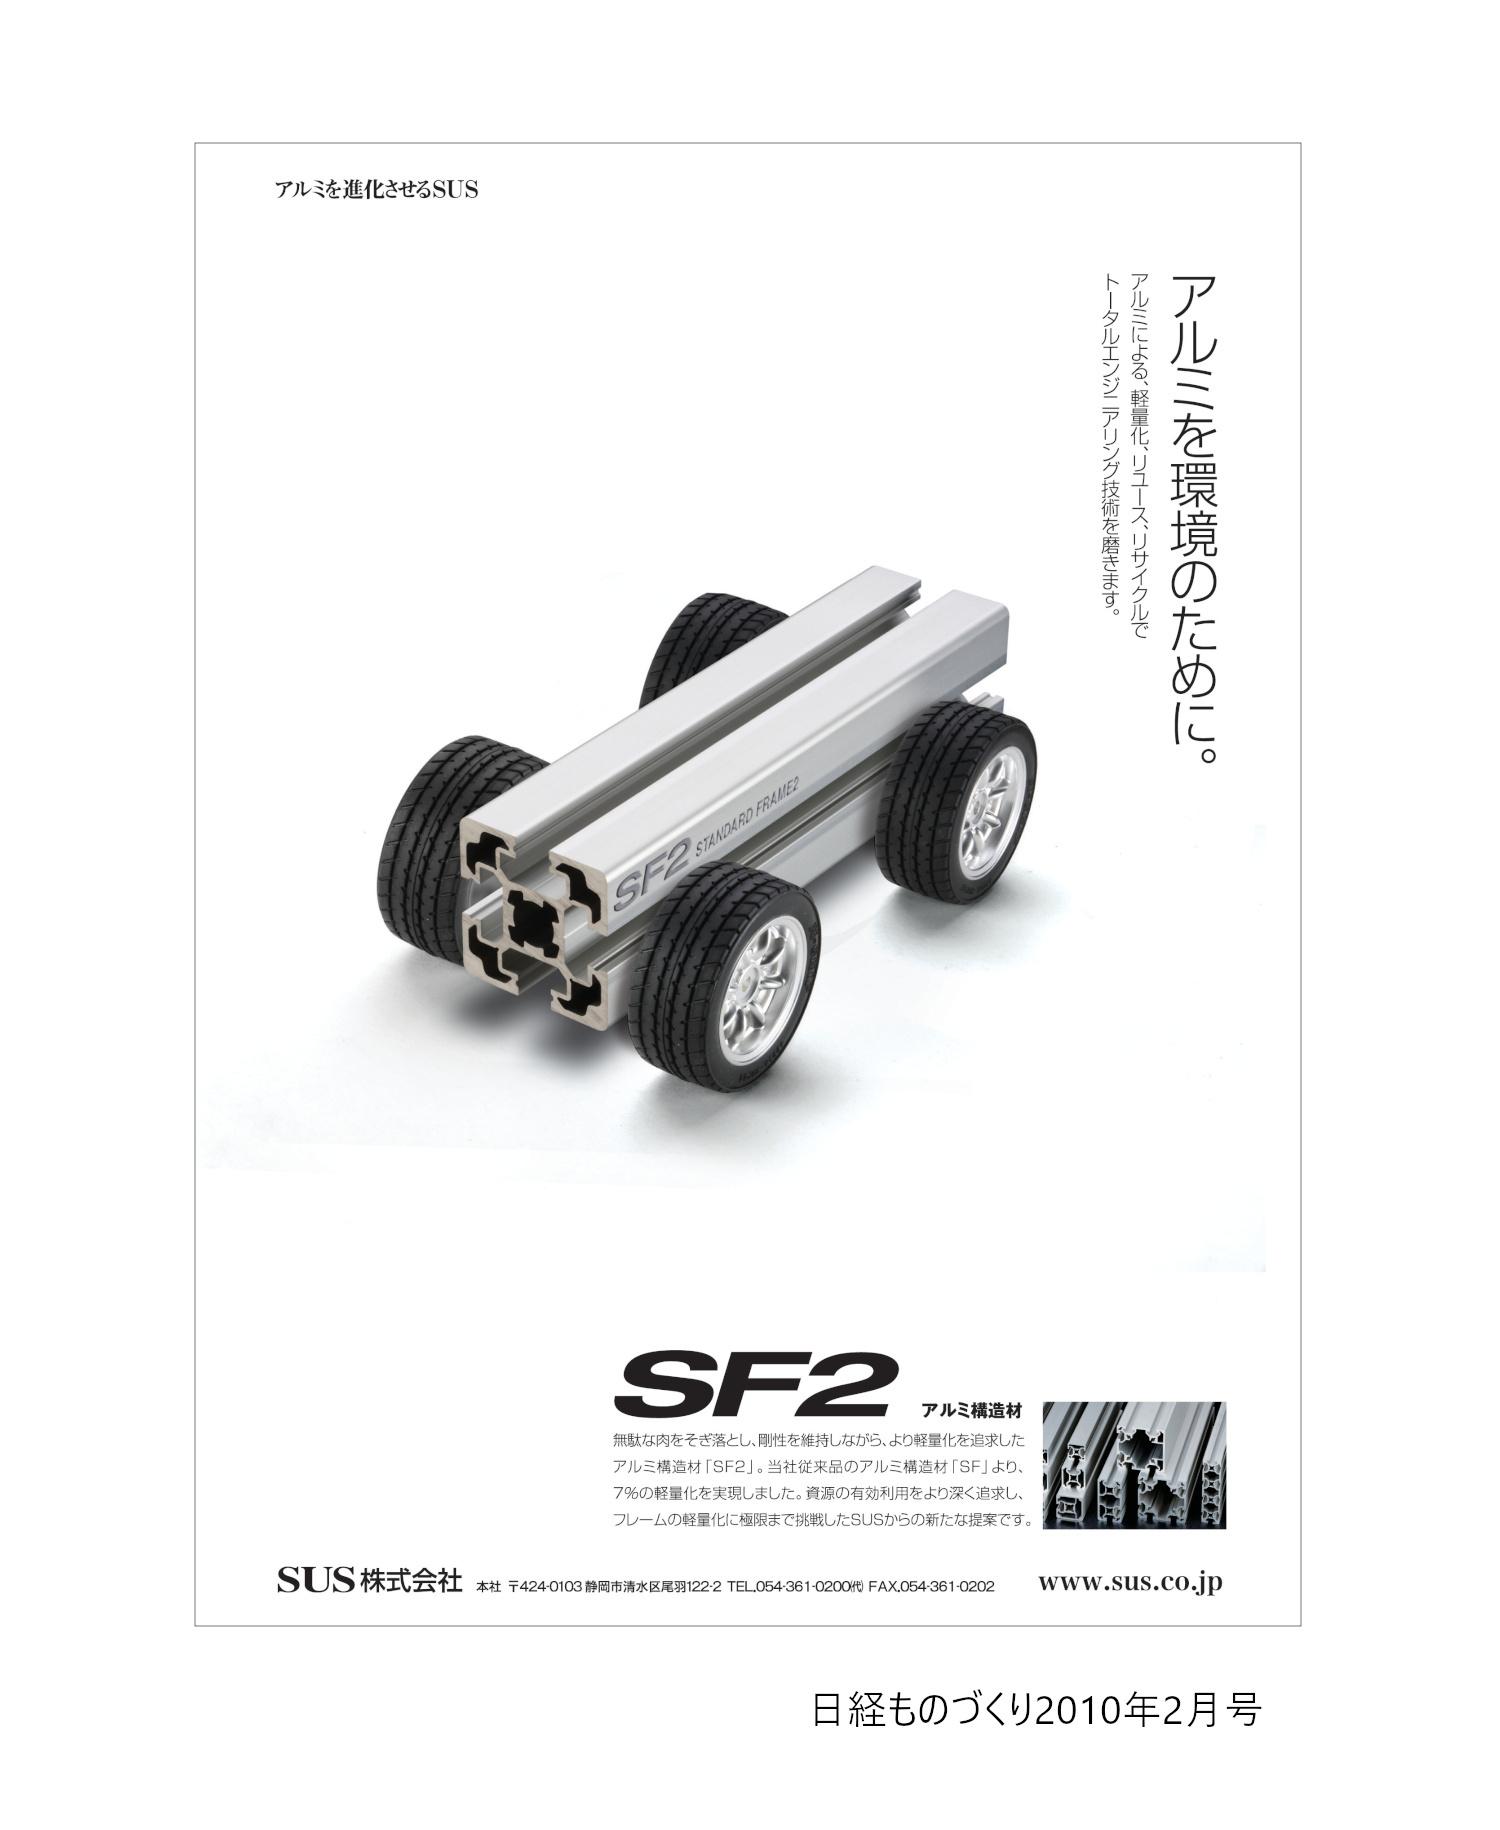 SUS株式会社様広告